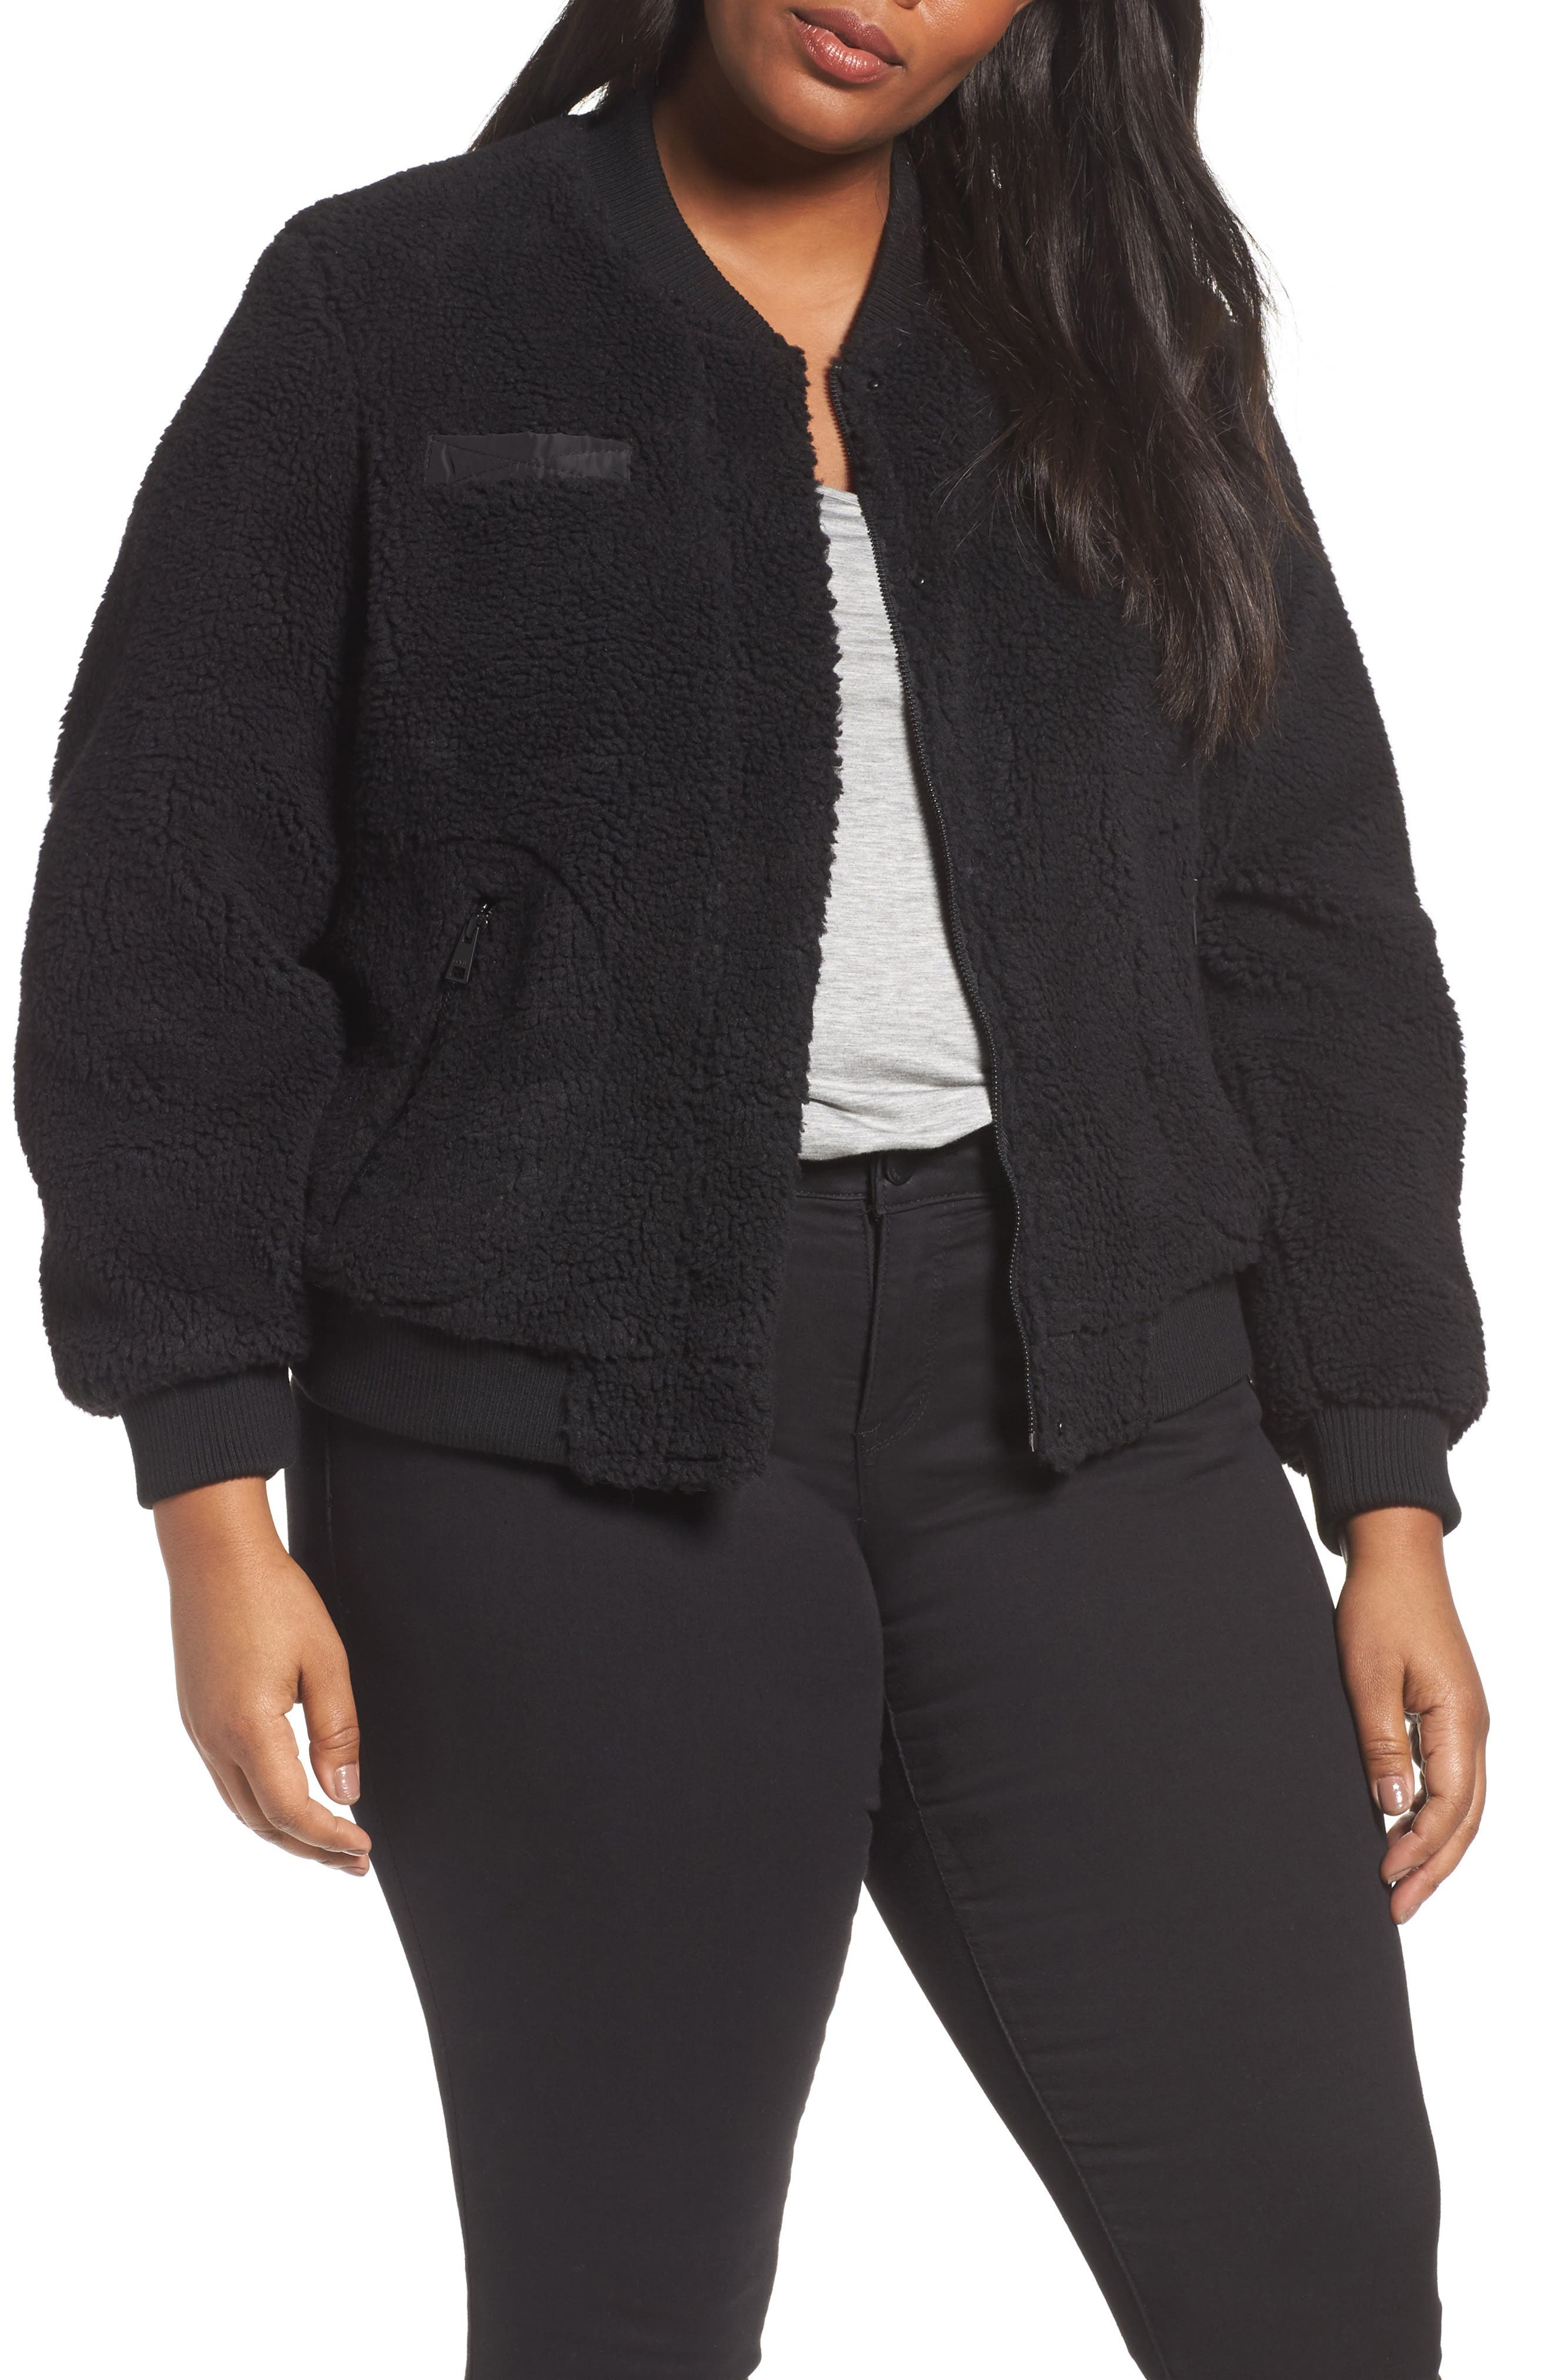 Rib Knit Fleece Bomber Jacket,                             Main thumbnail 1, color,                             Black